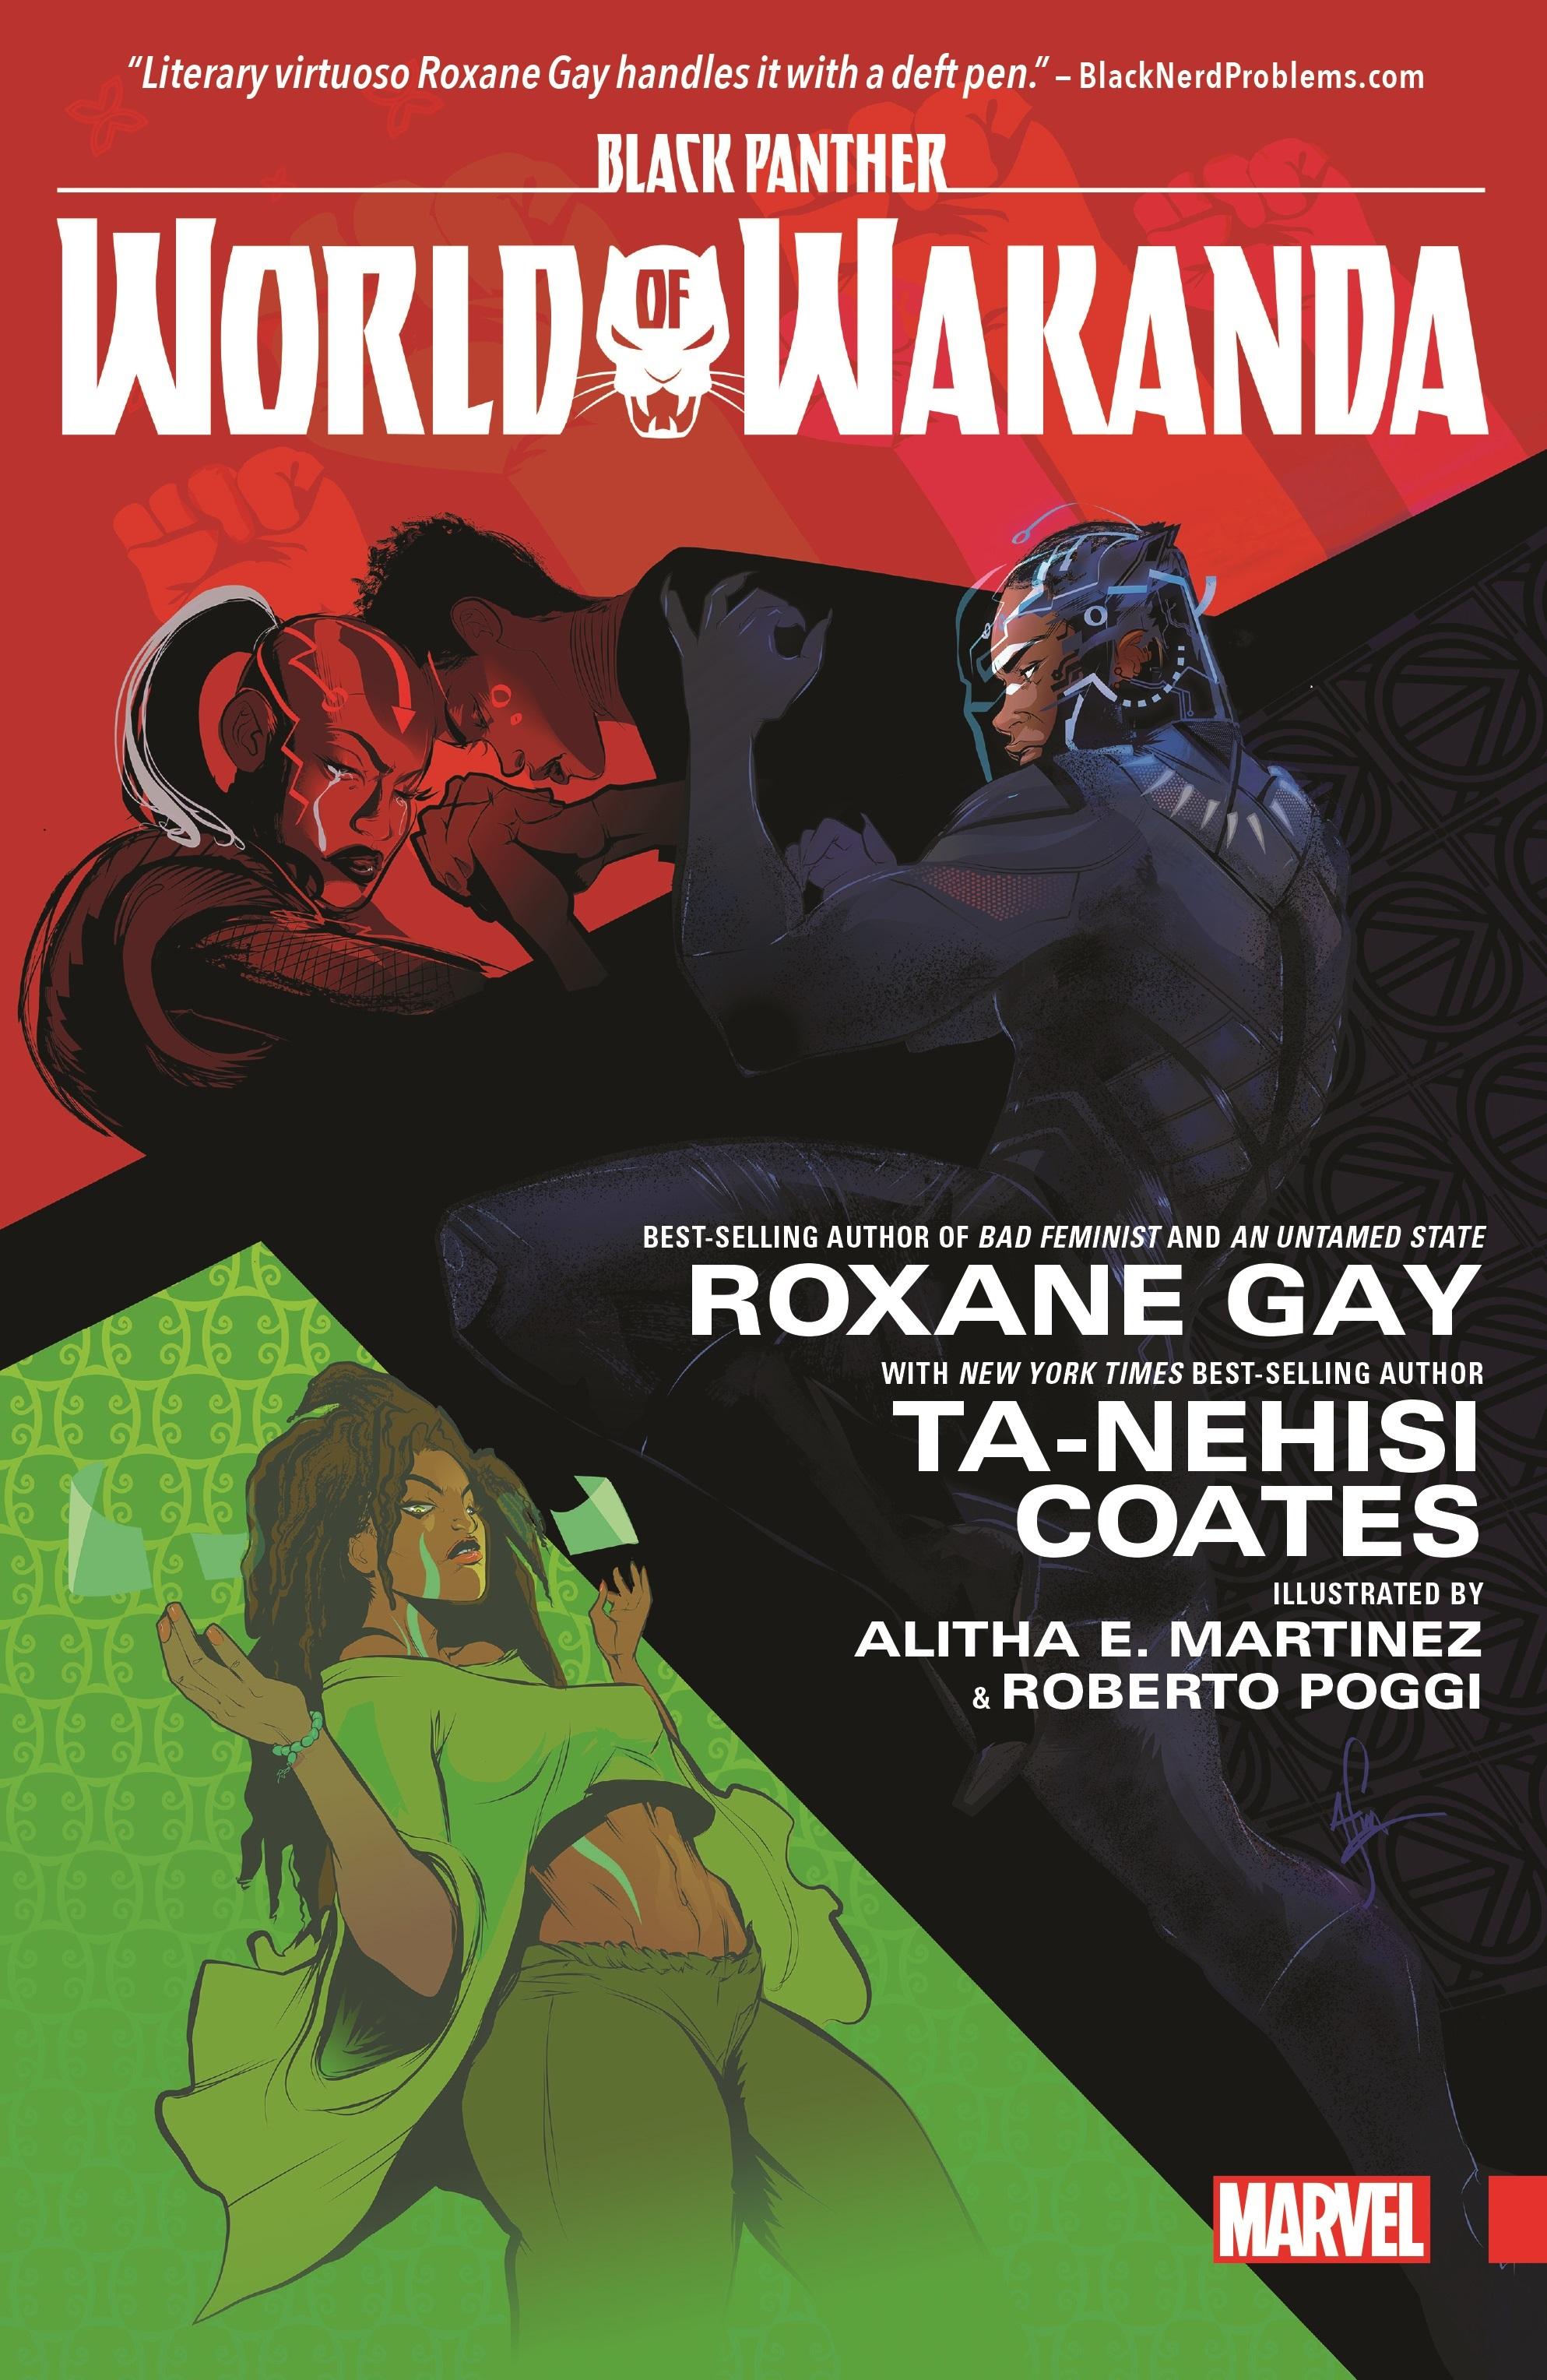 Black Panther World of Wakanda Marvel Graphic Novel Comic Book